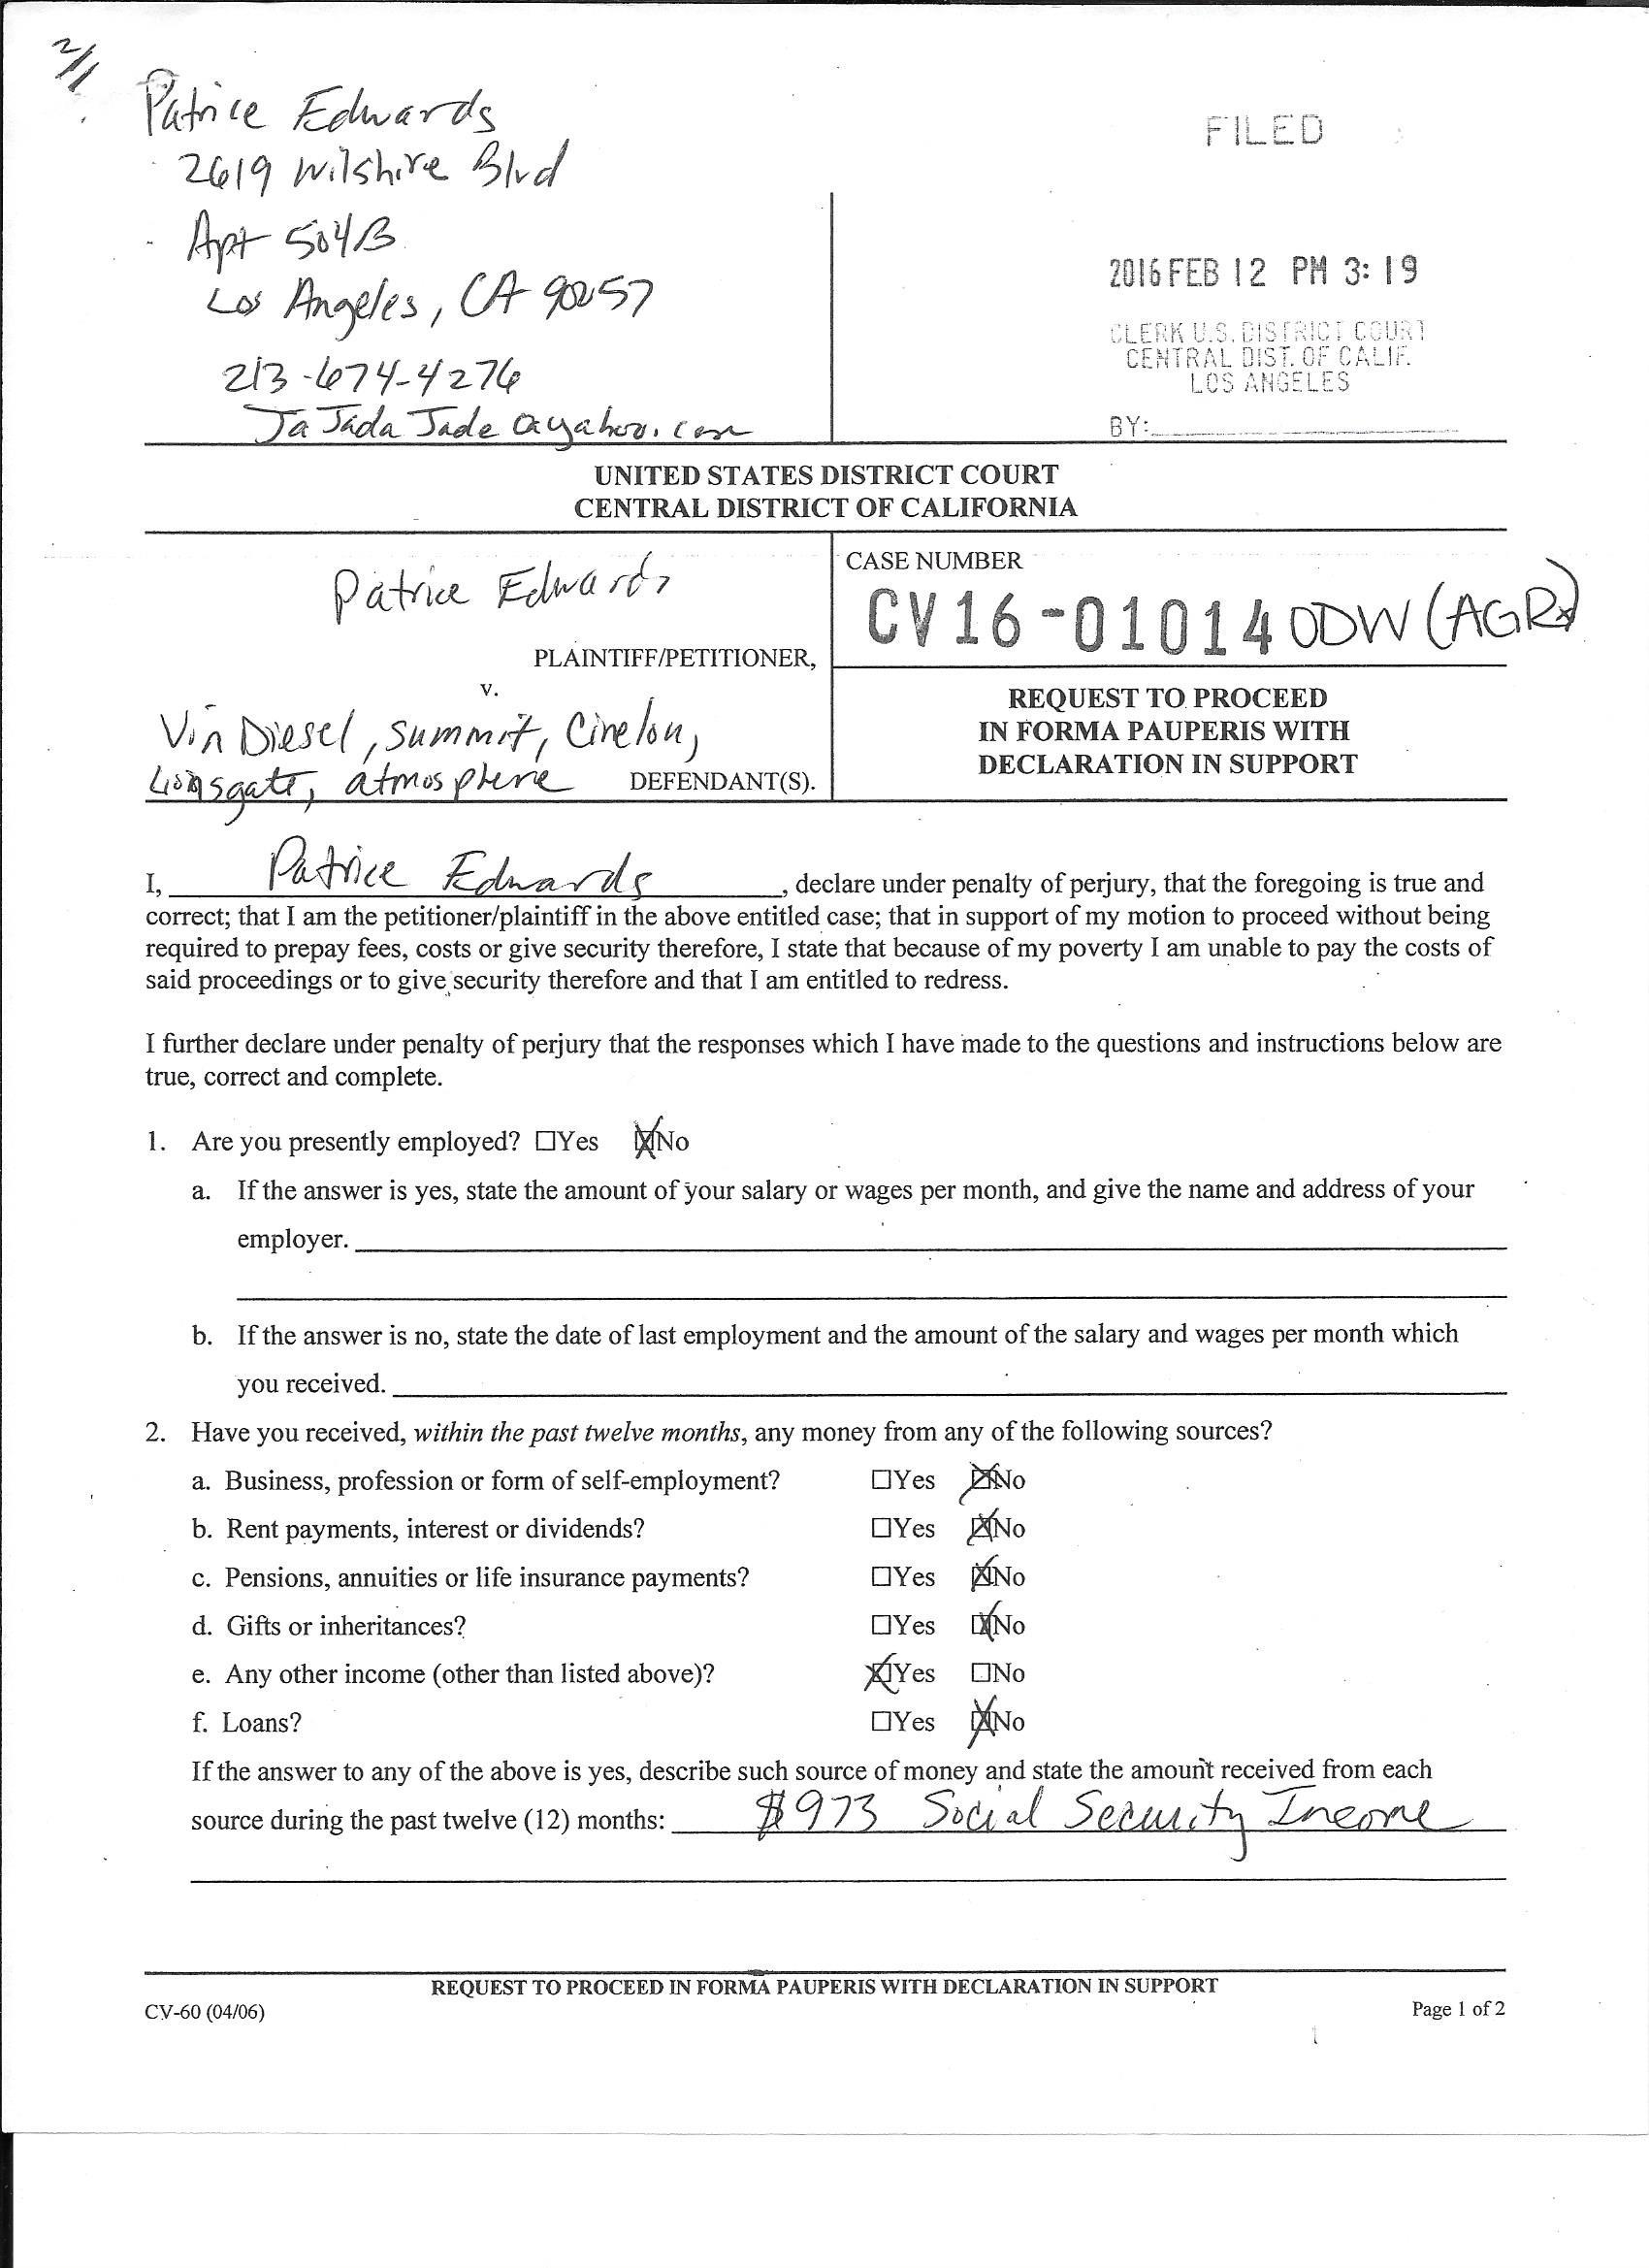 Screenwriter, Patrice Edwards, Files Lawsuit Alleging